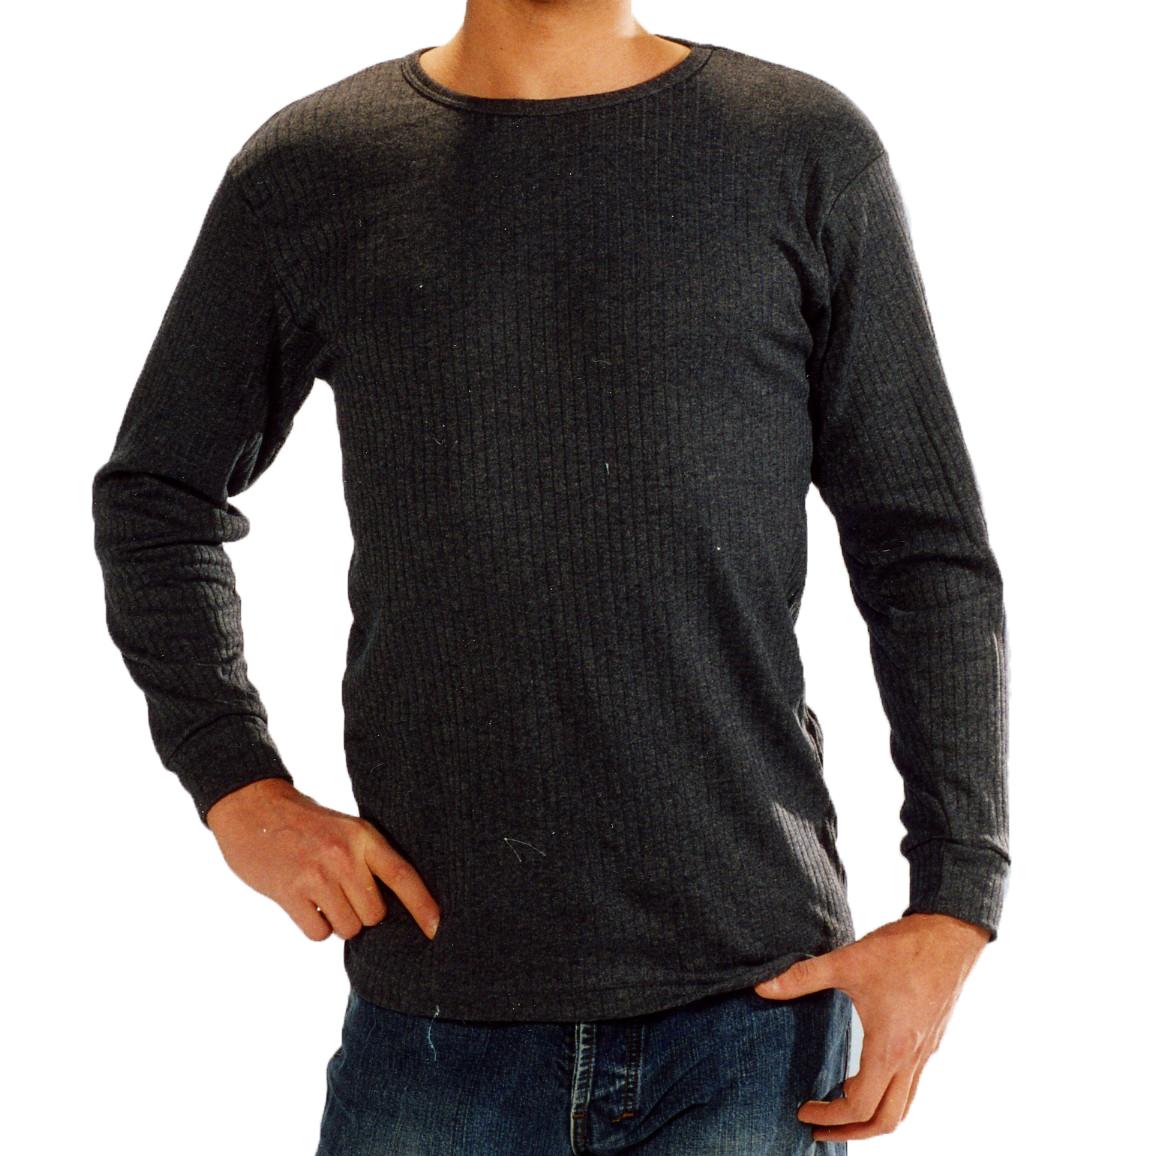 Herren Thermo-Unterhemd langarm (1/1 Arm), Thermo Active Wear - 45446